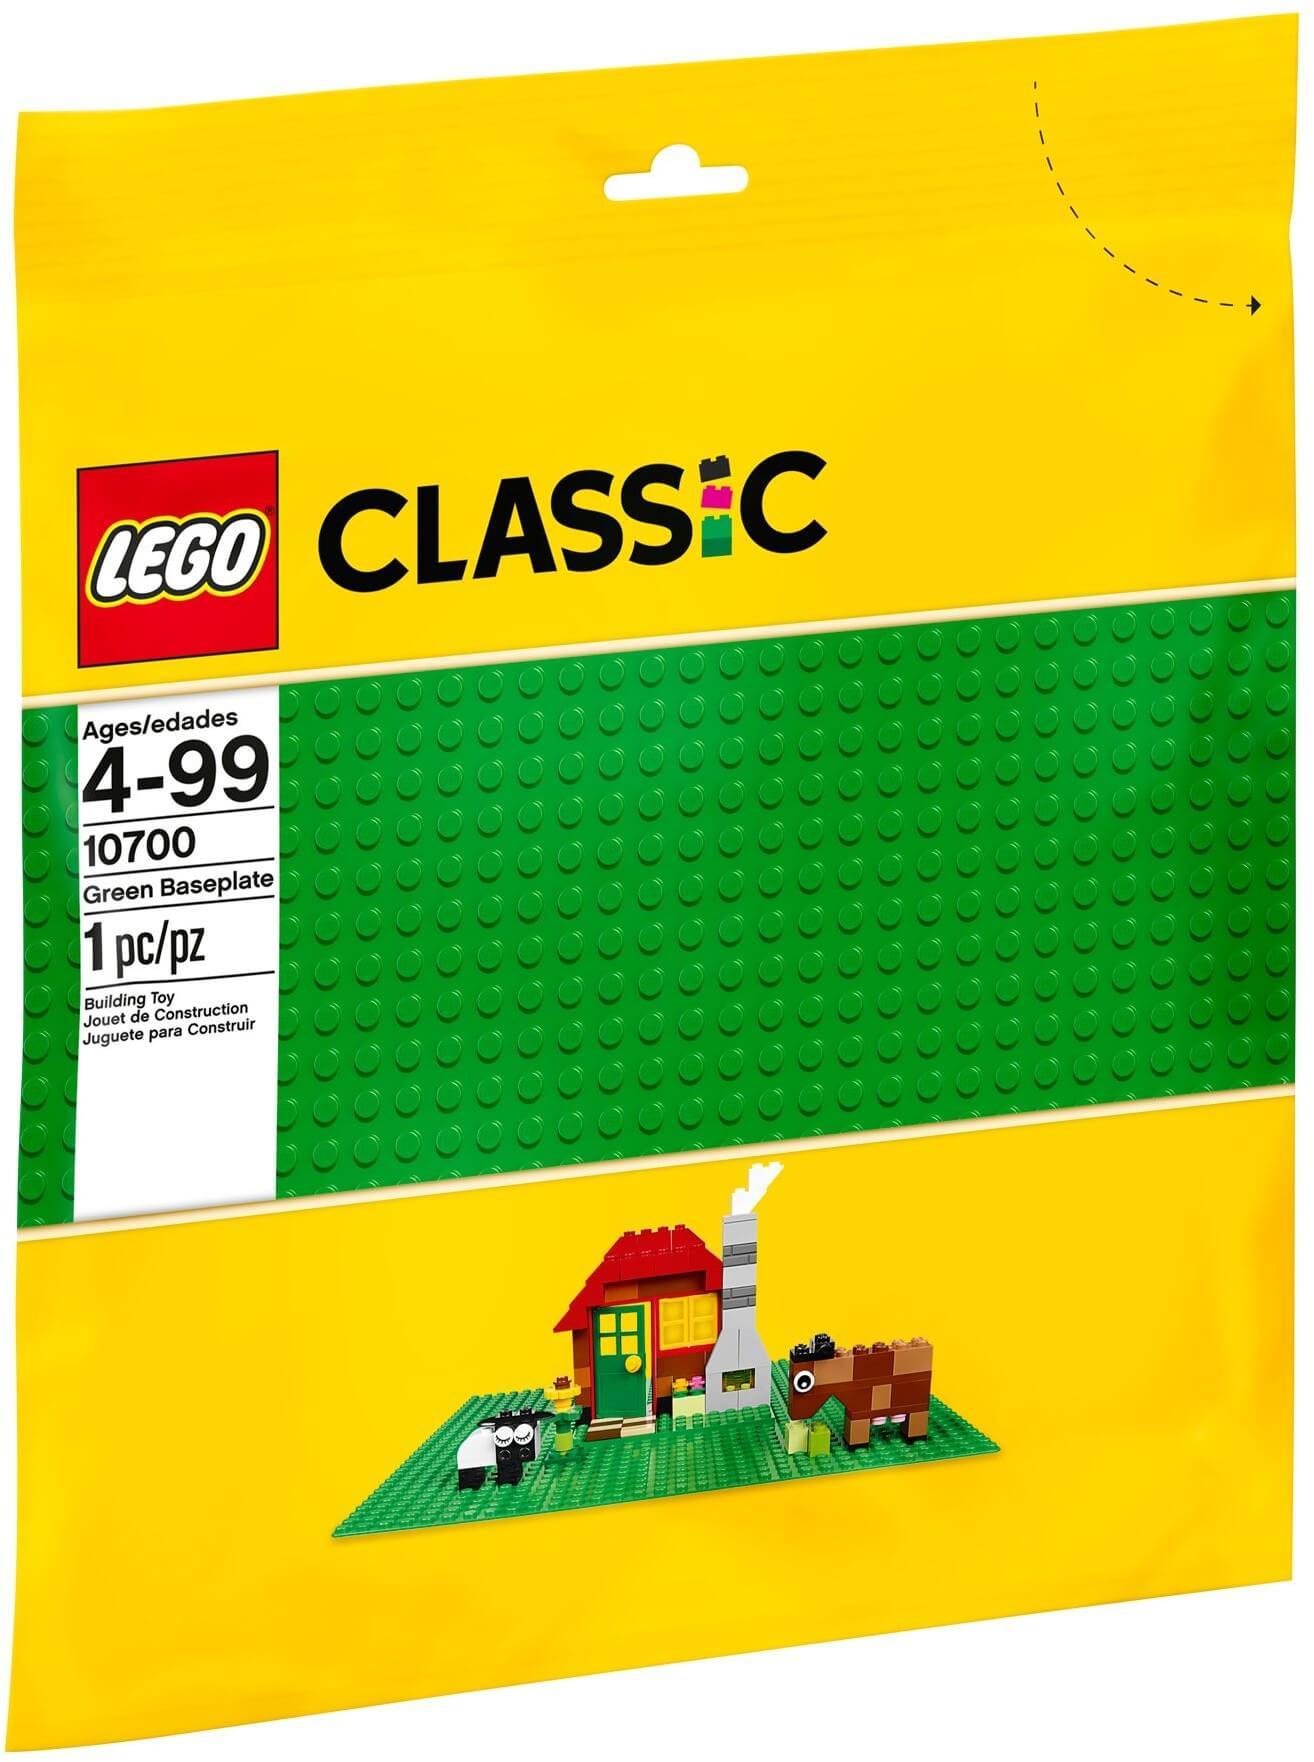 Mua đồ chơi LEGO 10700 - LEGO Classic 10700 - Tấm nền Xanh 32 x 32 LEGO Classic (LEGO Classic Green Baseplate 10700)